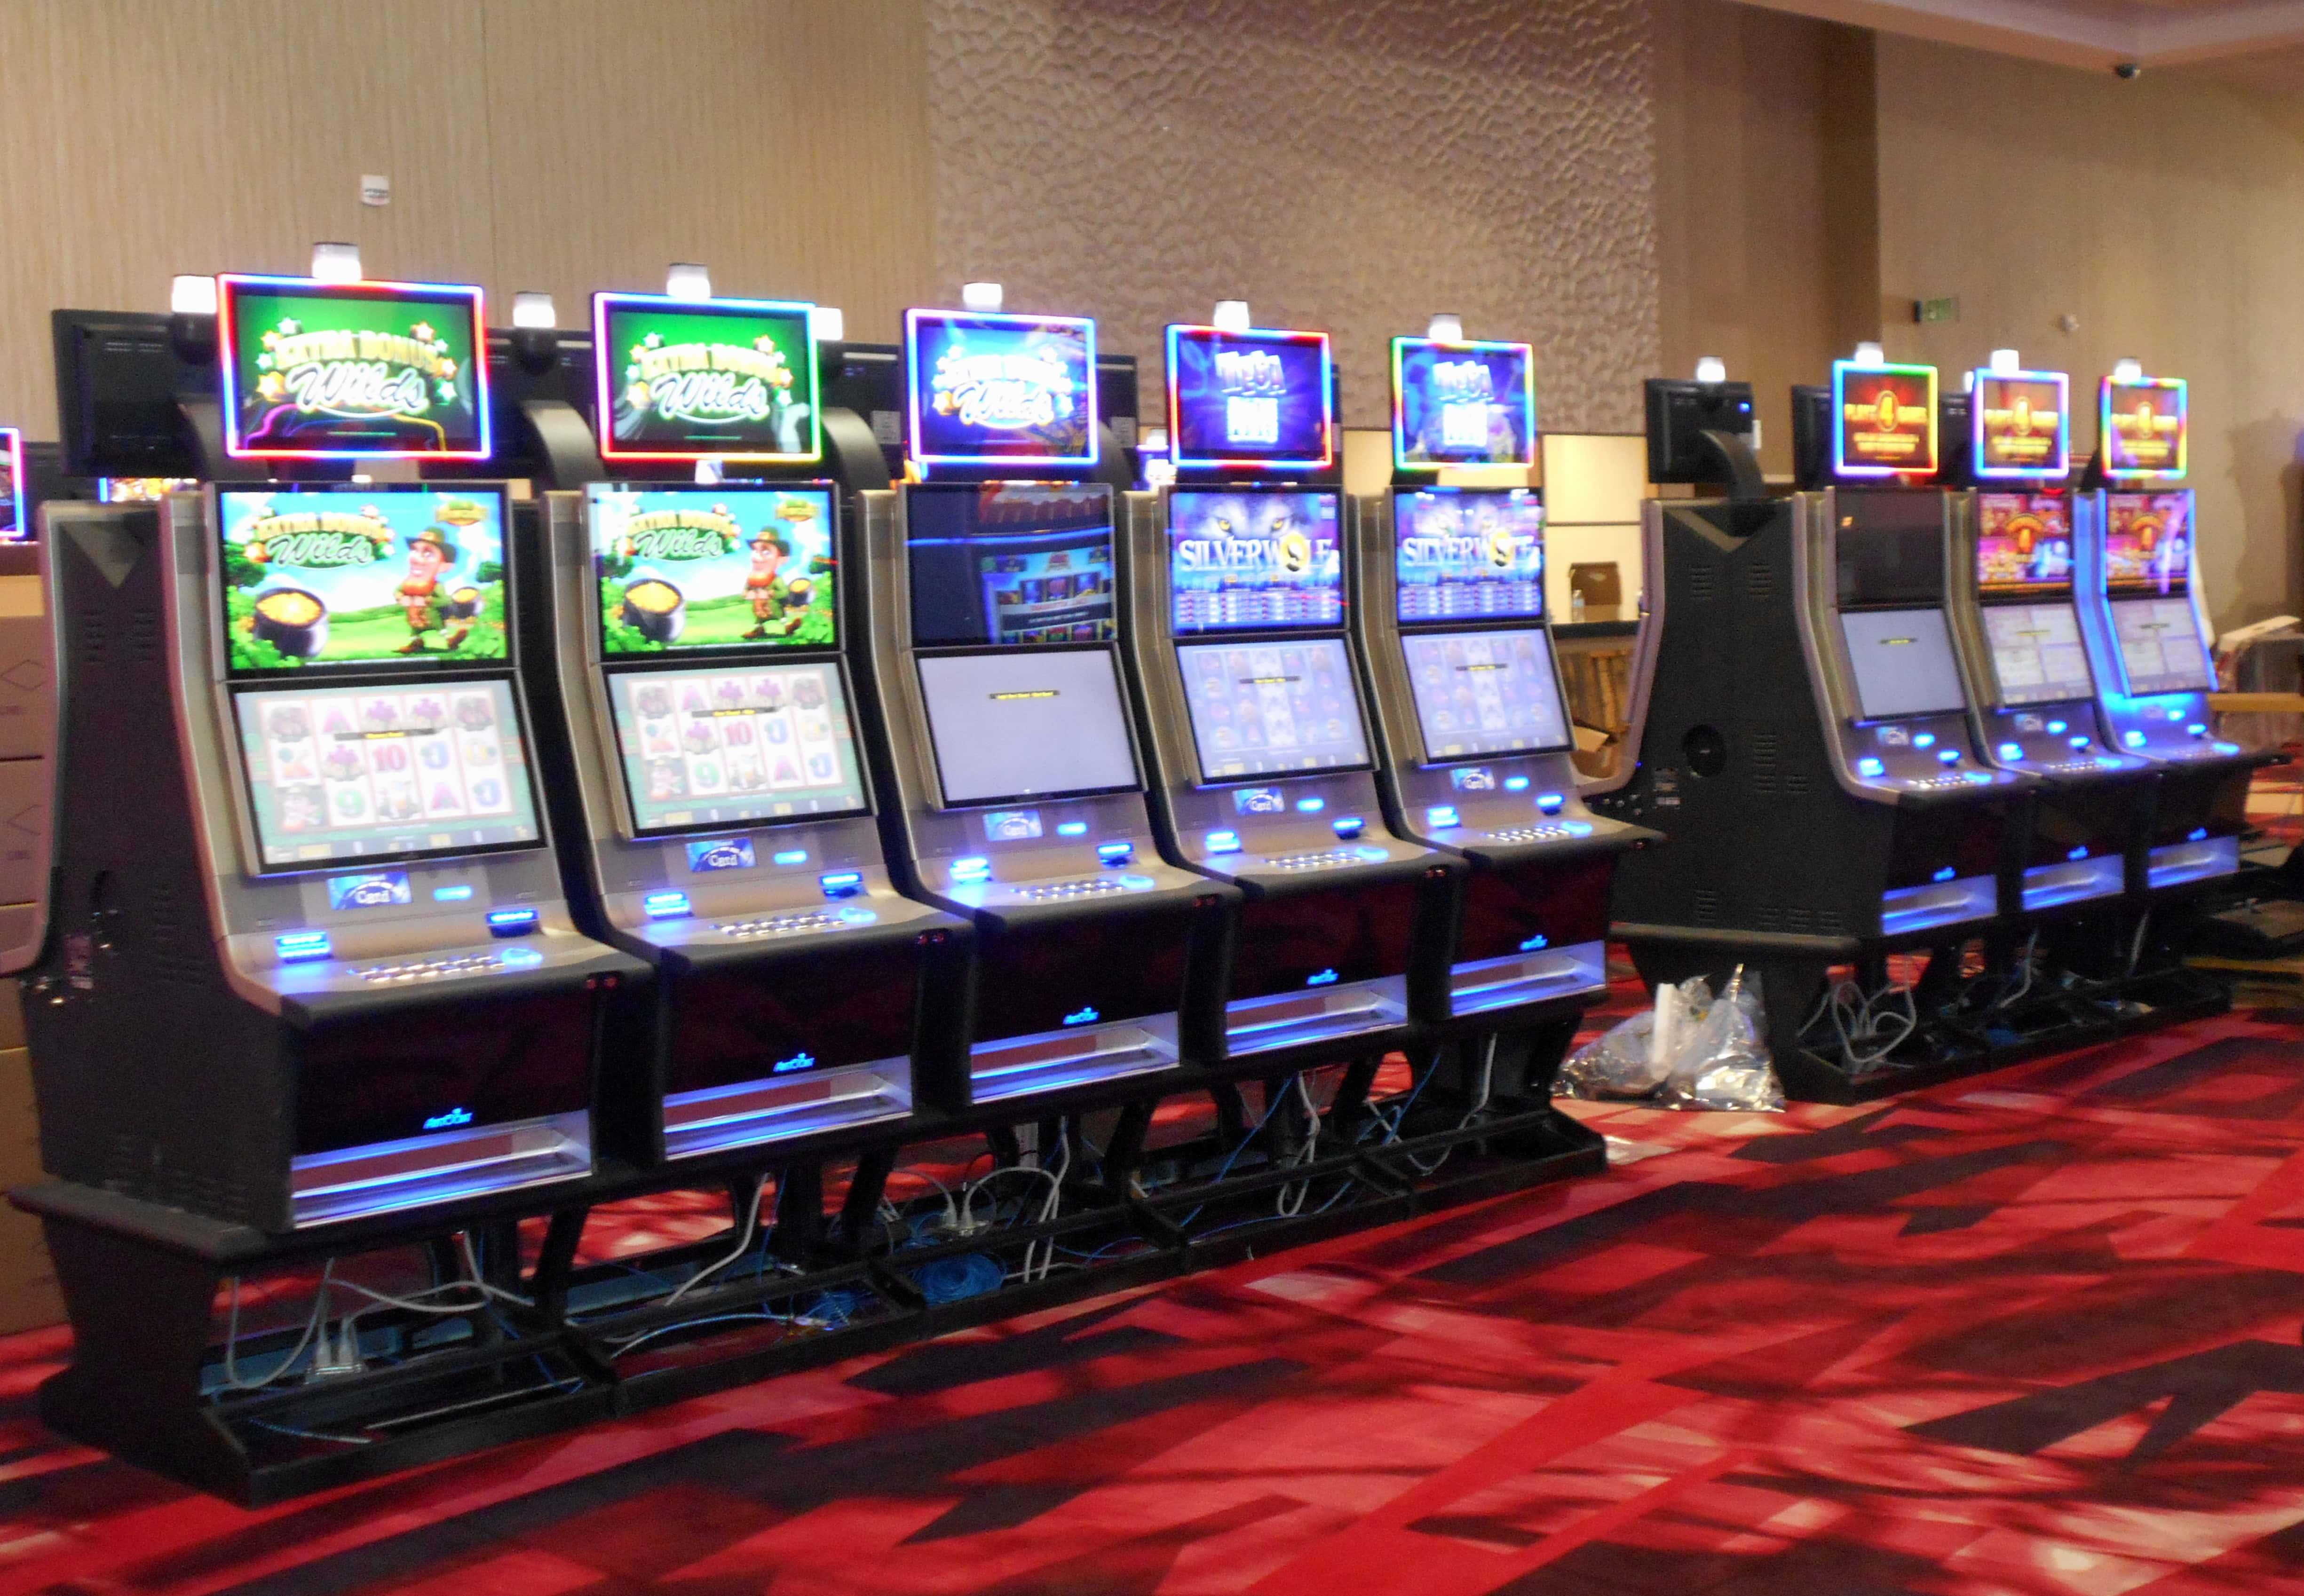 Bet365 sports betting casino